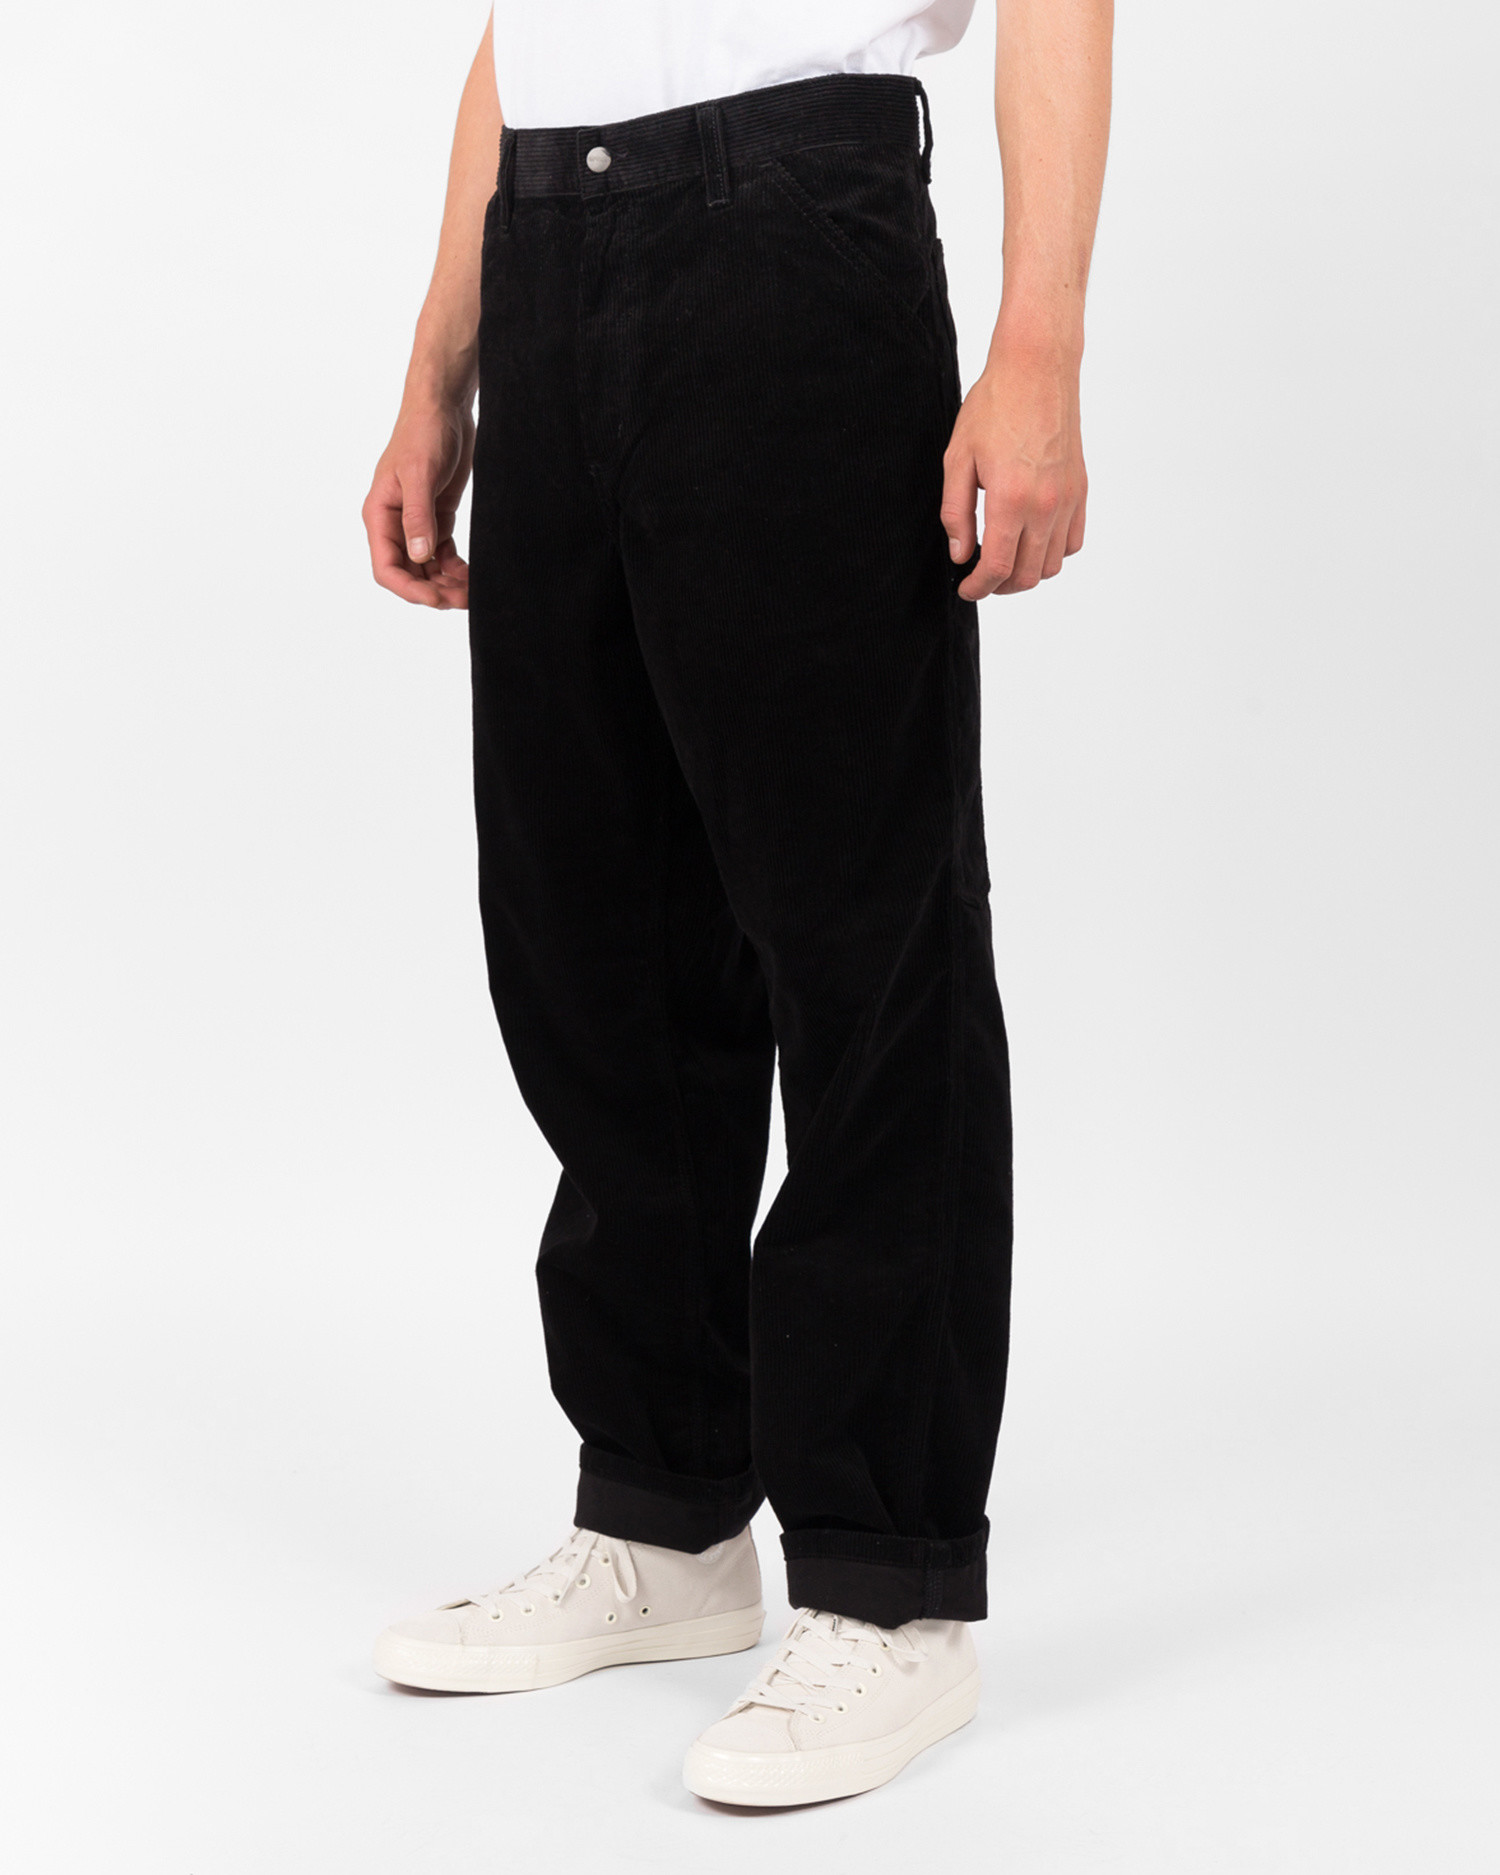 Carhartt Corduroy Single knee pant Cotton black rinsed